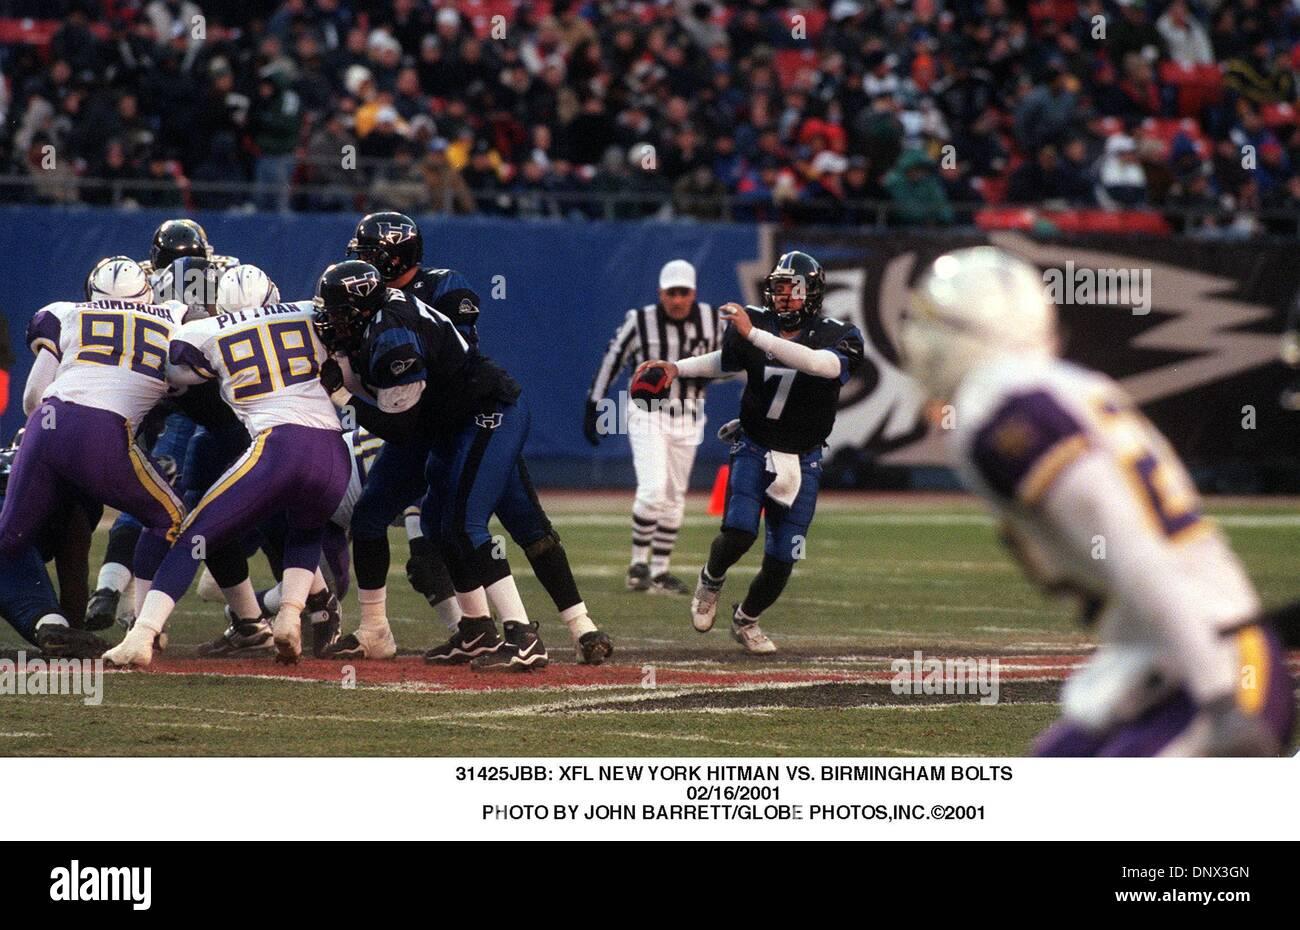 Febrero 16, 2001 - 31425JBB: NUEVA YORK XFL HITMAN VS. Tornillos de Birmingham.16/02/2001. JOHN BARRETT/ 2001(Crédito Imagen: © Globe Photos/ZUMAPRESS.com) Foto de stock